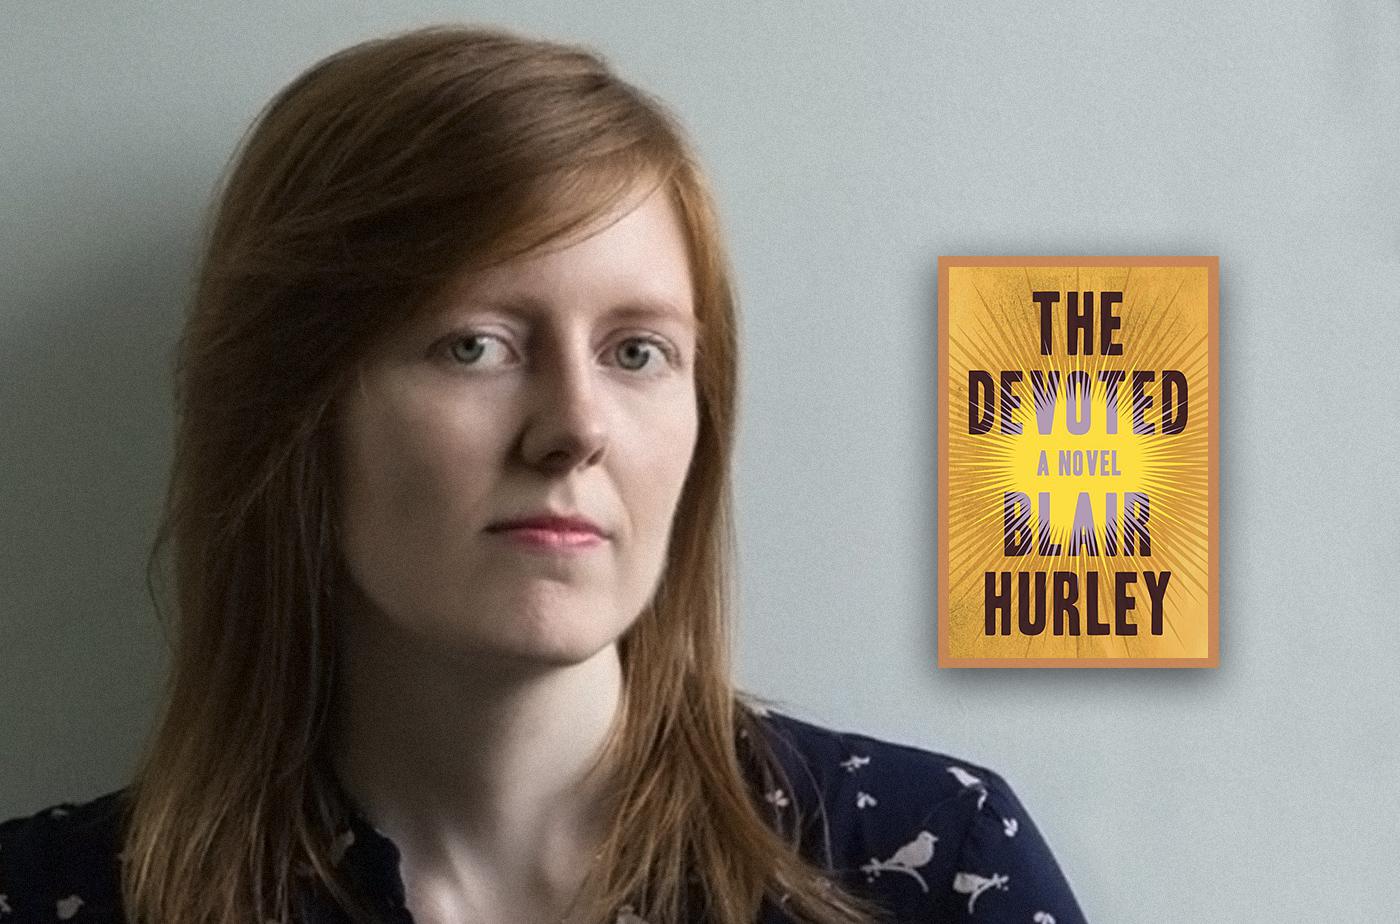 Catapult online classes: Blair Hurley, 6-Week Online Fiction Workshop: Launching into Your Novel, Novel, Fiction, Workshop